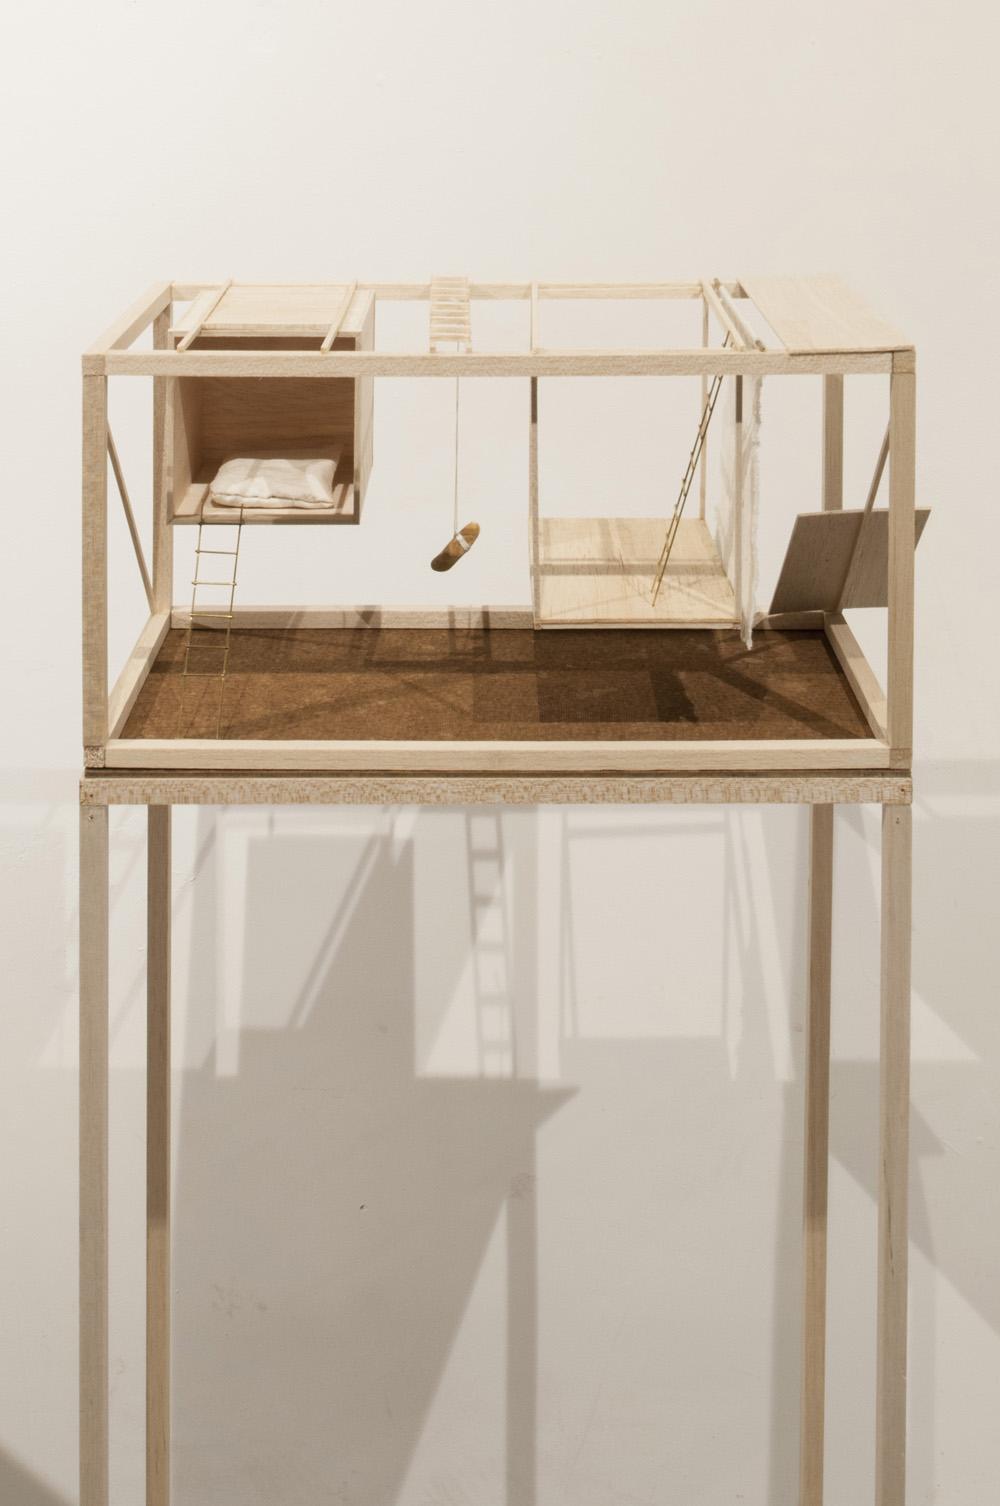 Maison 02, 2015, balsa, brass, print on balsa, stone, wire, cotton house 20 x 20 x 40 cm, pedestal 20 x 40 x 120 cm